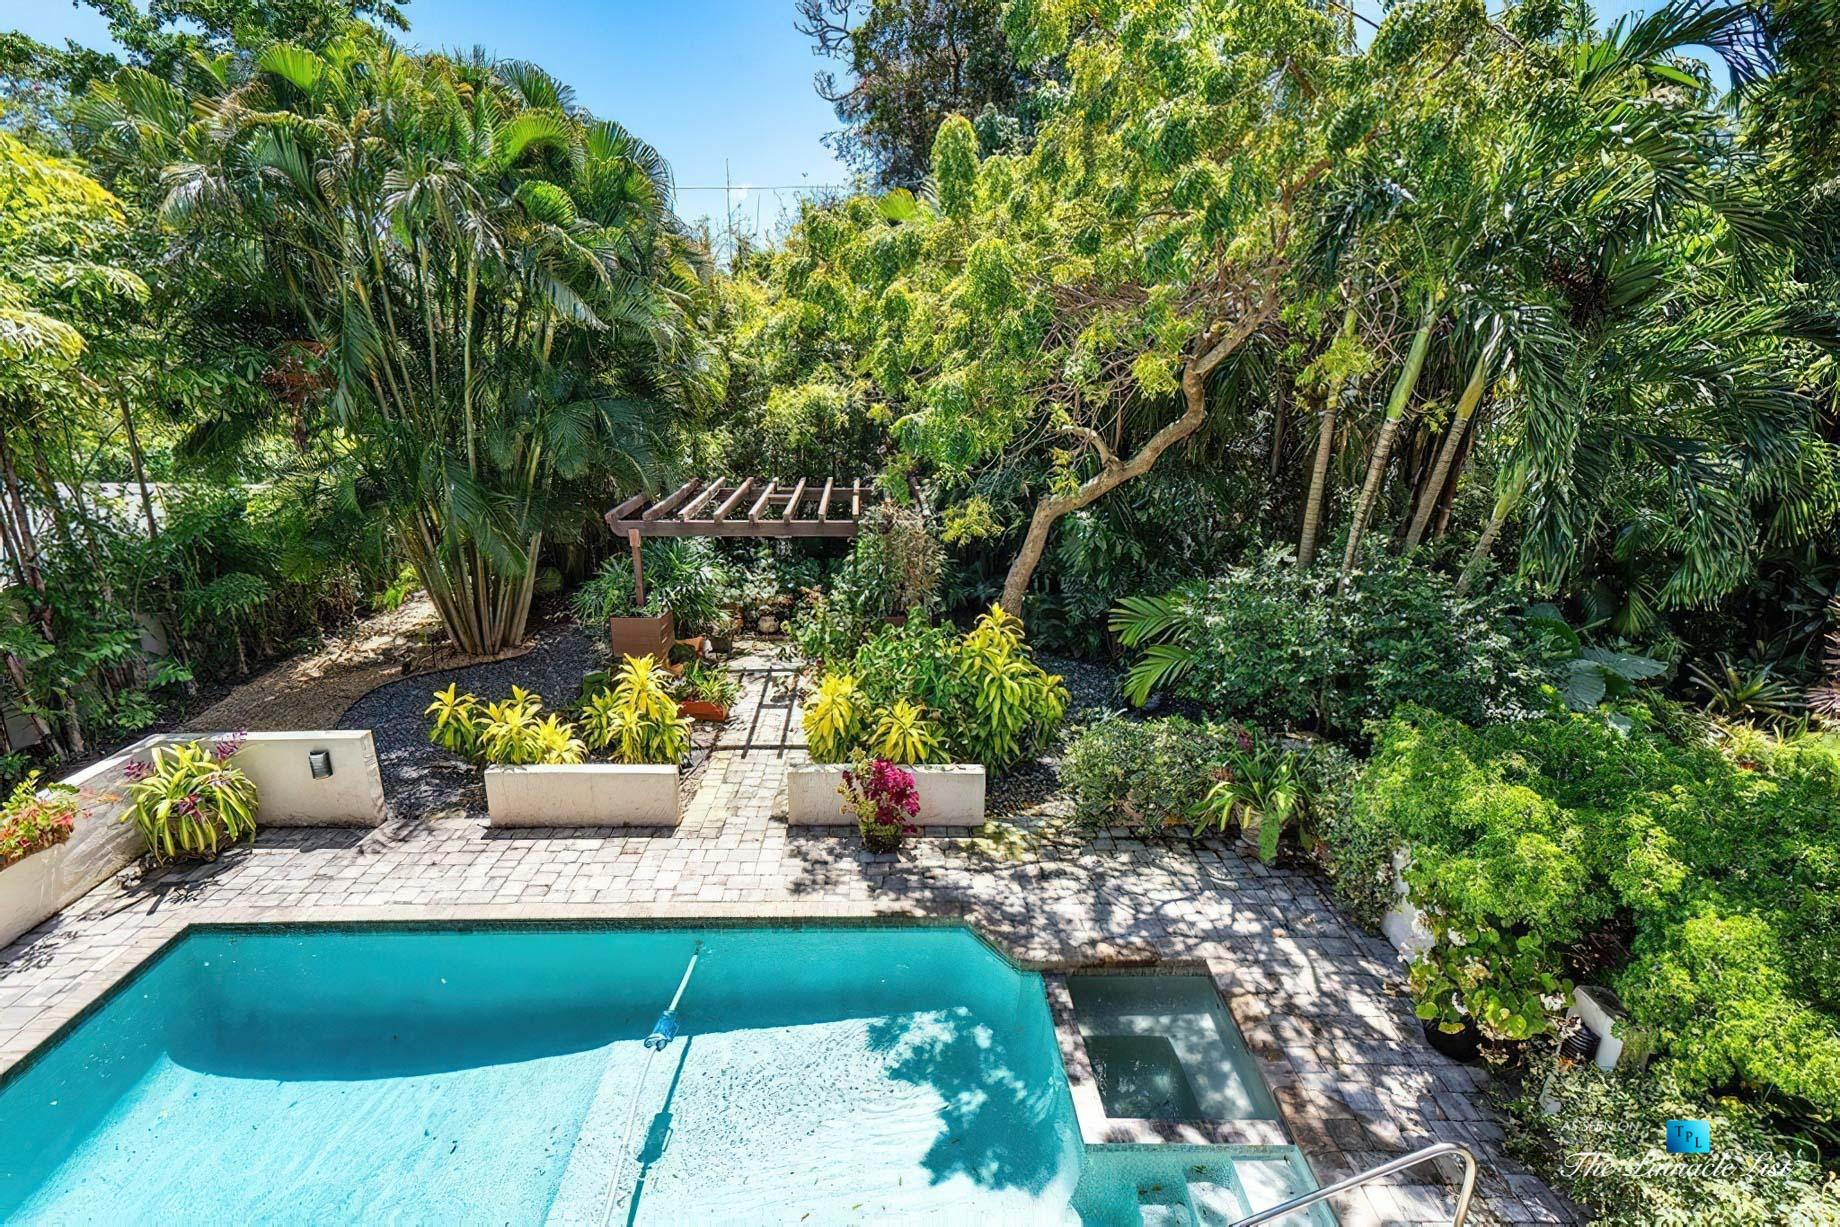 888 Oleander St, Boca Raton, FL, USA - Luxury Real Estate - Old Floresta Estate Home - Balcony Backyard Pool View